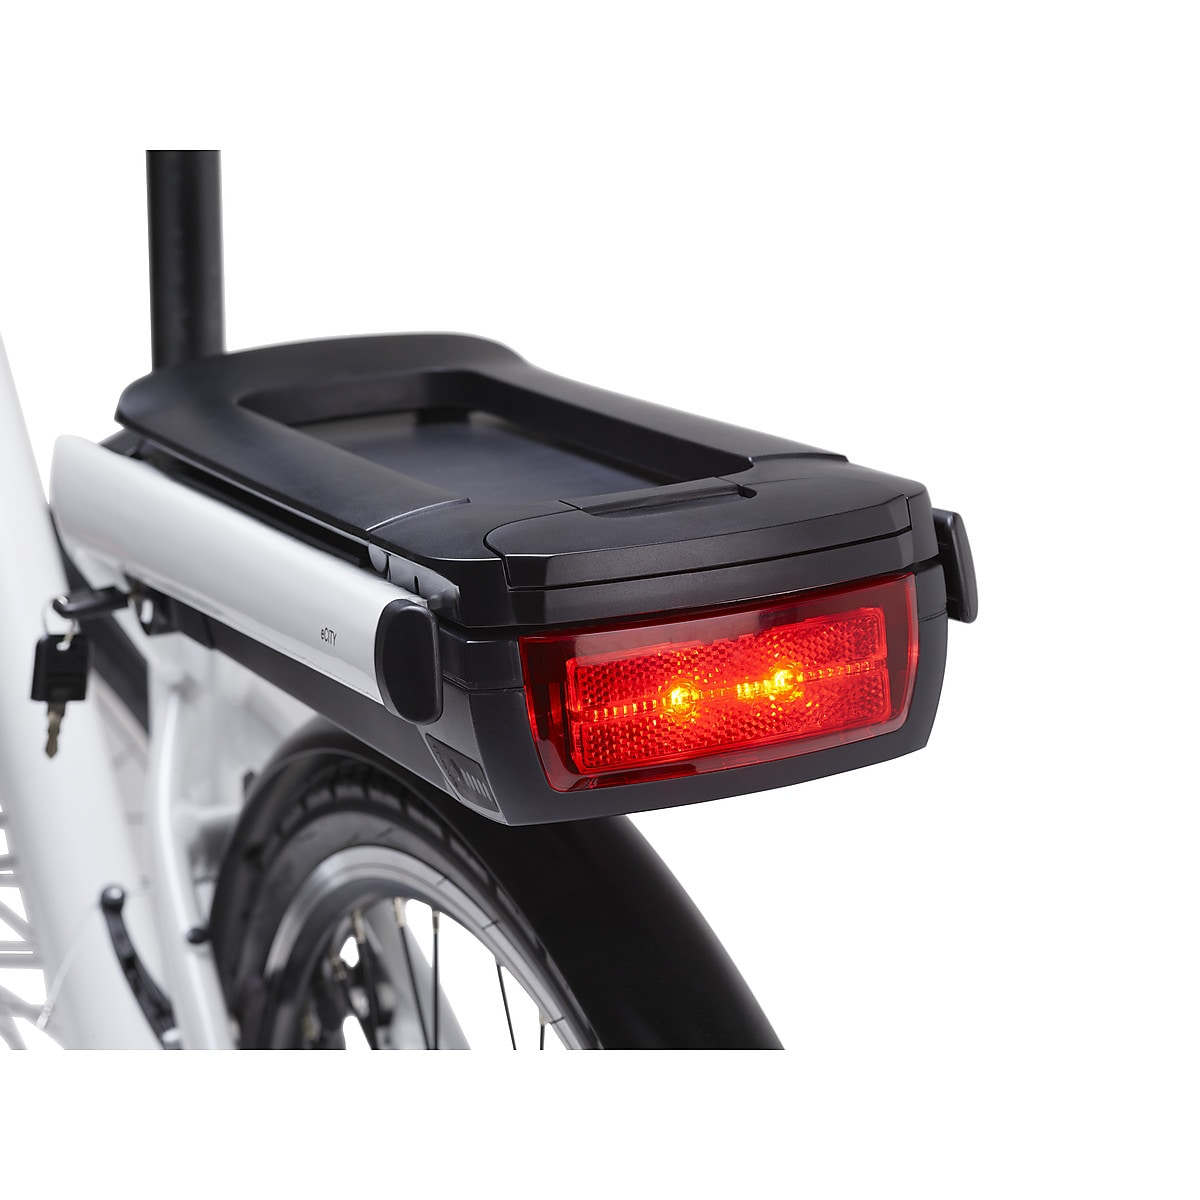 Asaklitt eCity 36 V Electric Bike